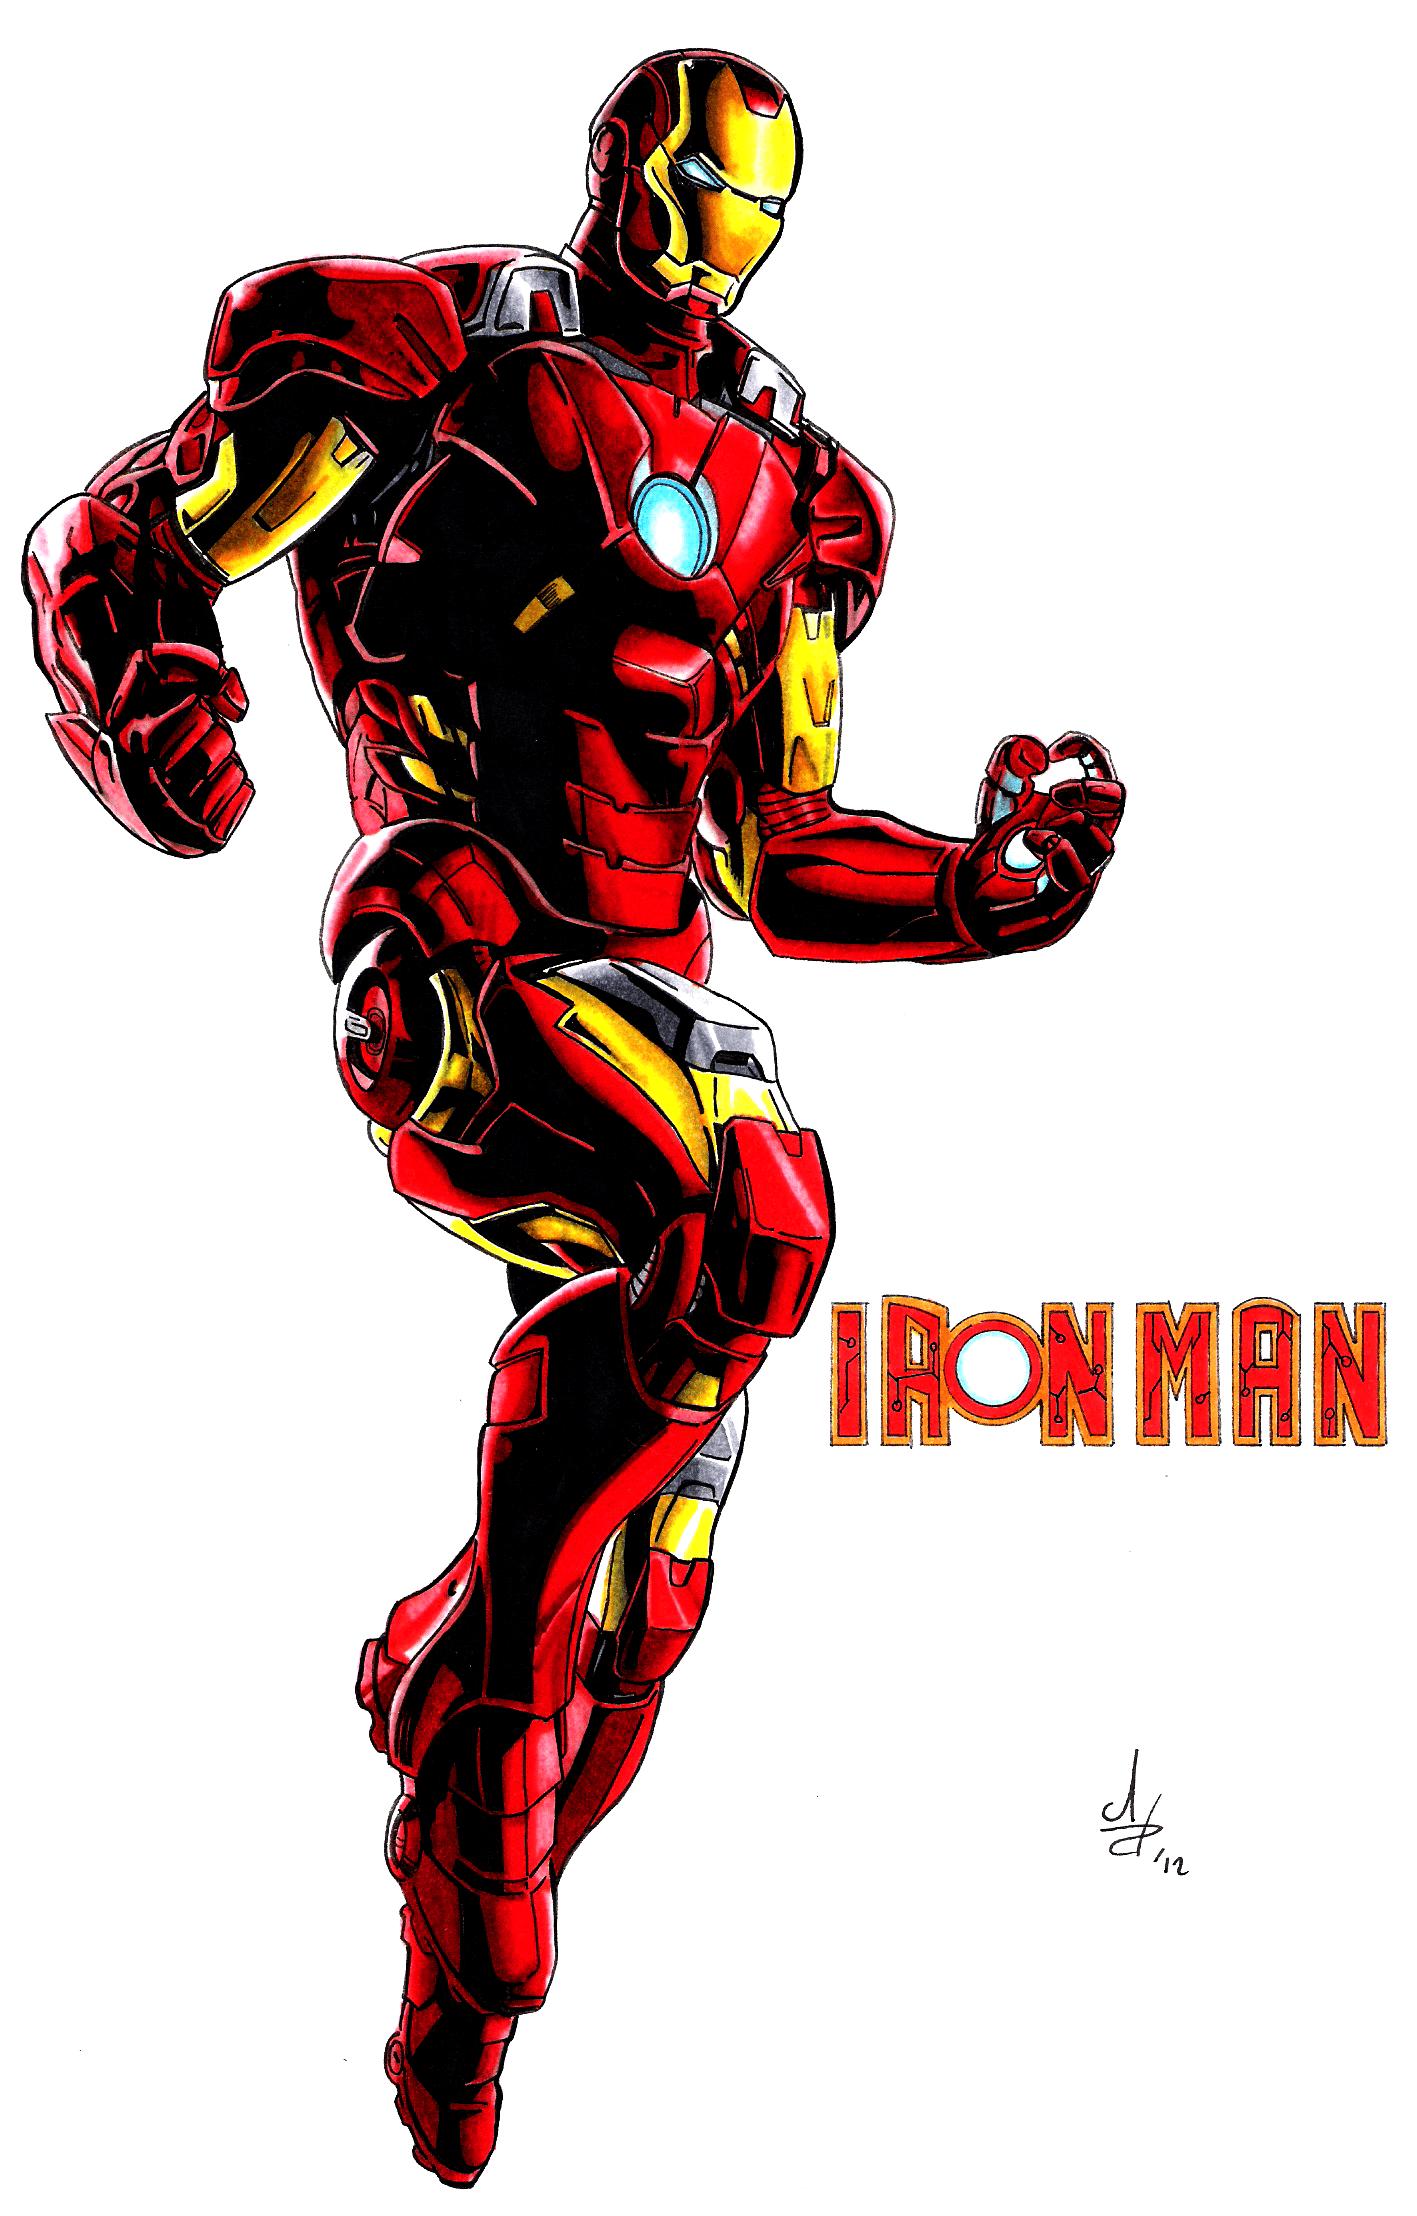 Avengers cartoon wallpapers top free avengers cartoon - Iron man cartoon wallpaper ...